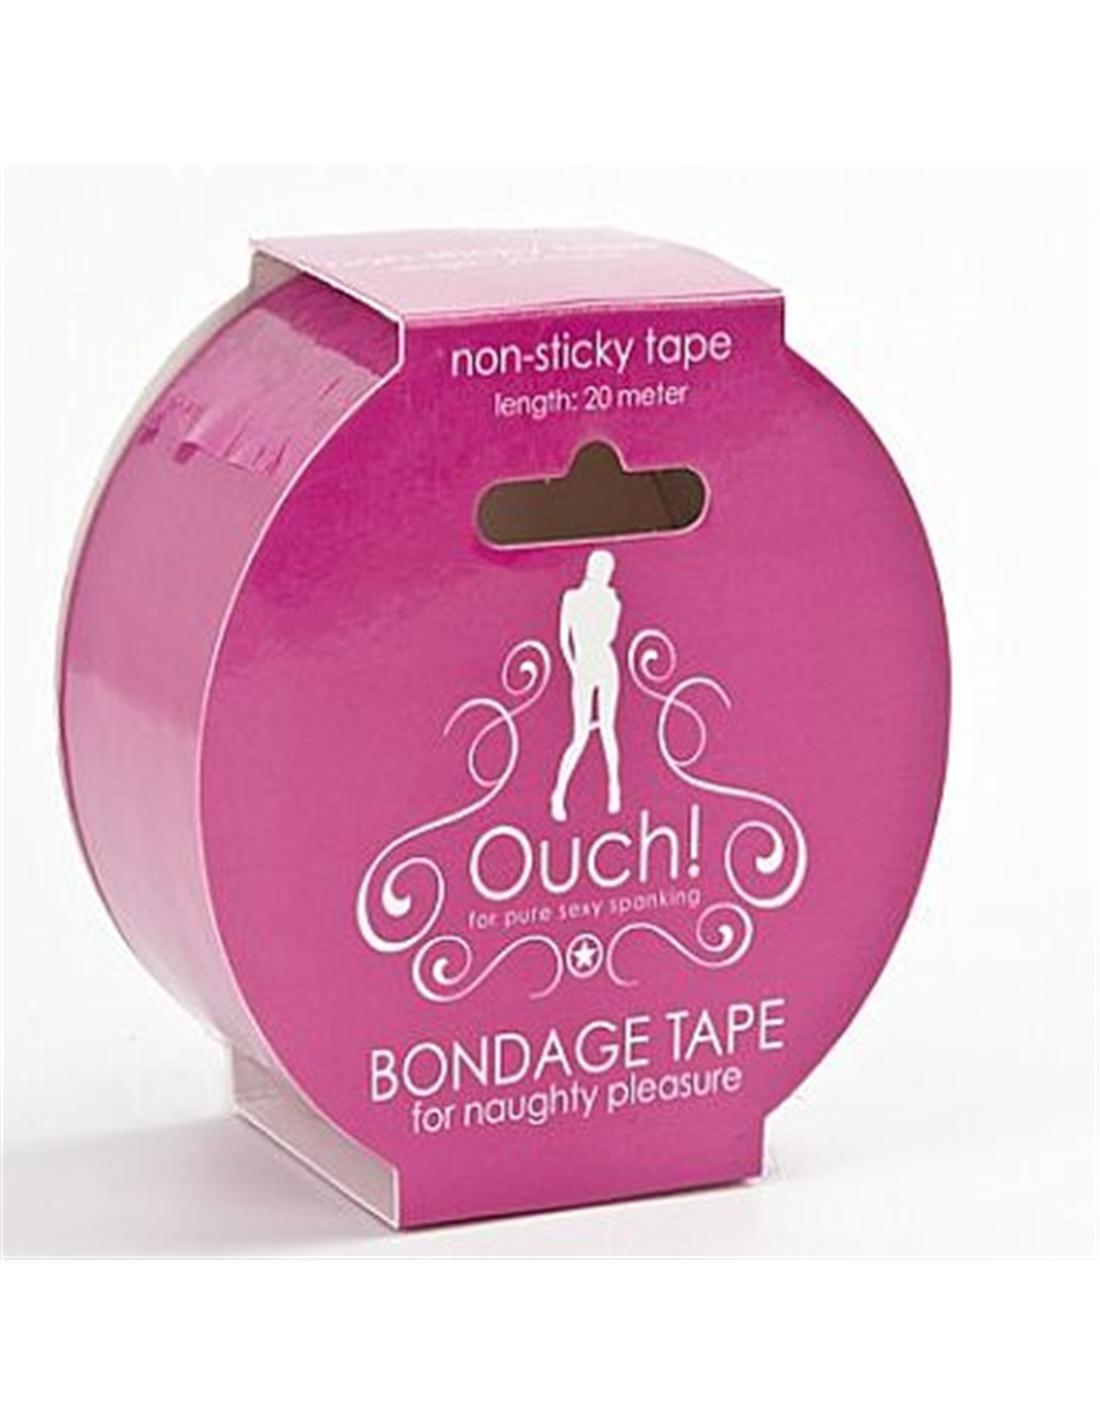 Fita Ouch! Bondage Tape Rosa - PR2010303458